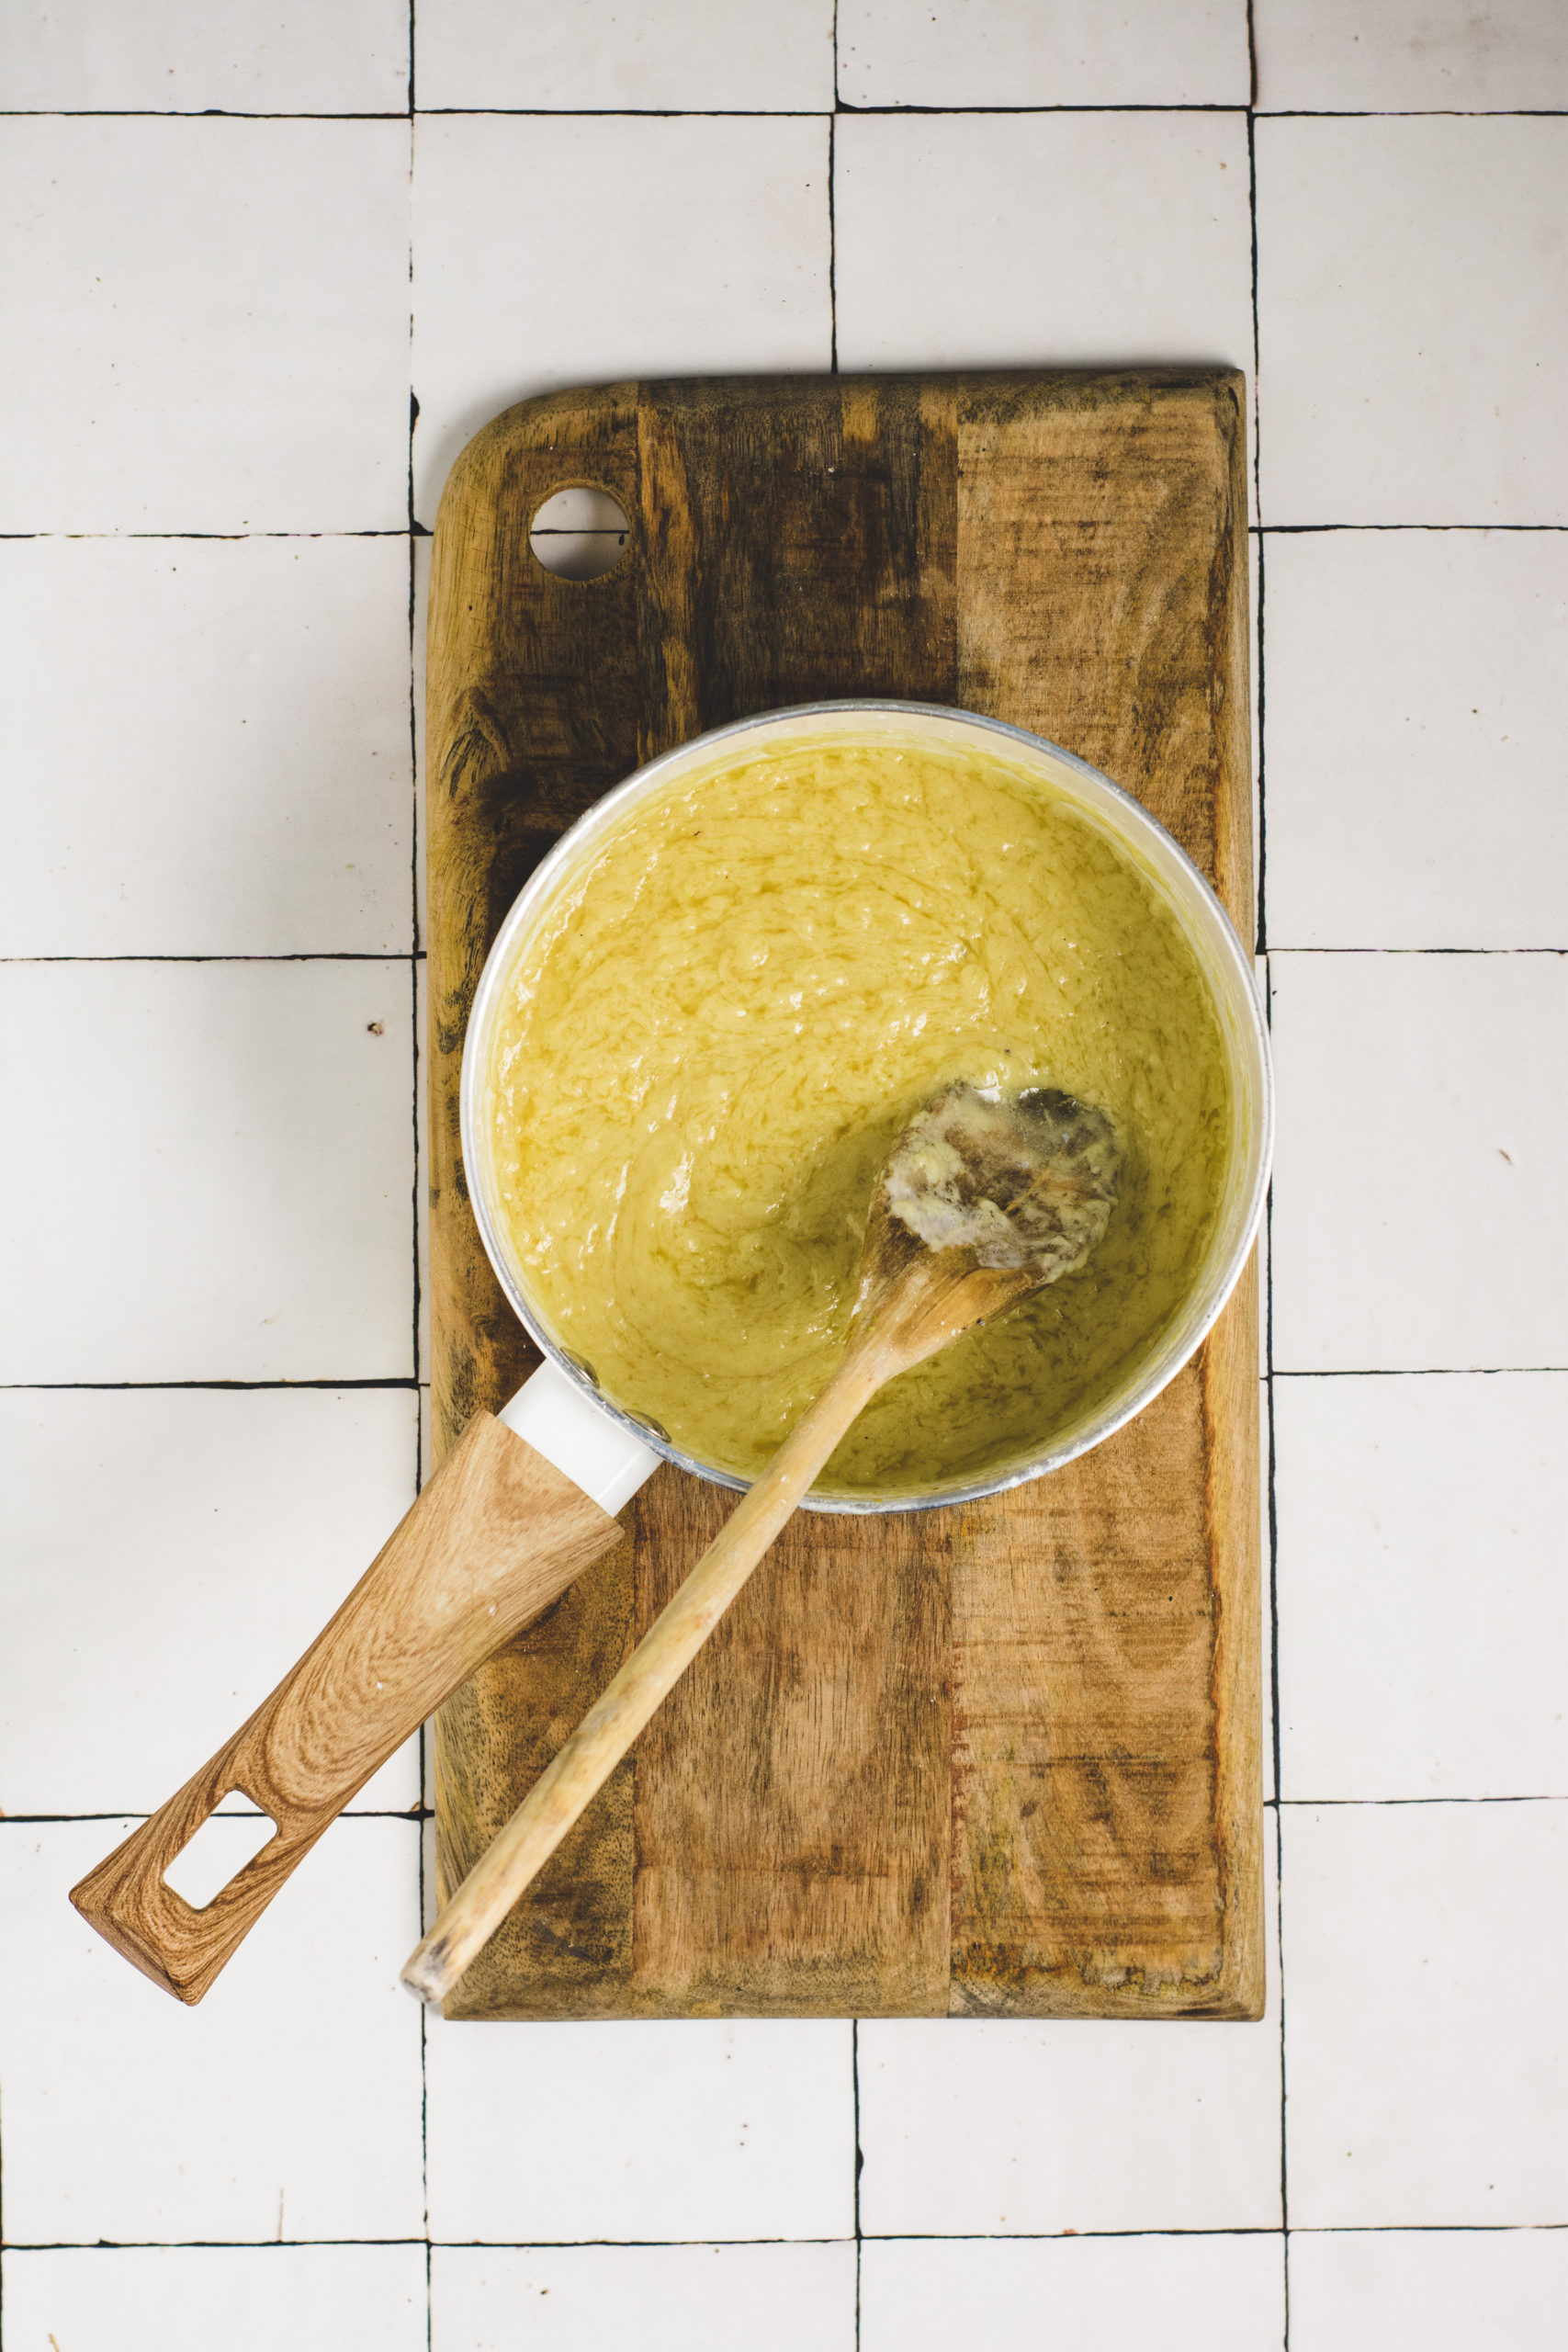 Vegan white cheddar sauce for vegan mashed cauliflower